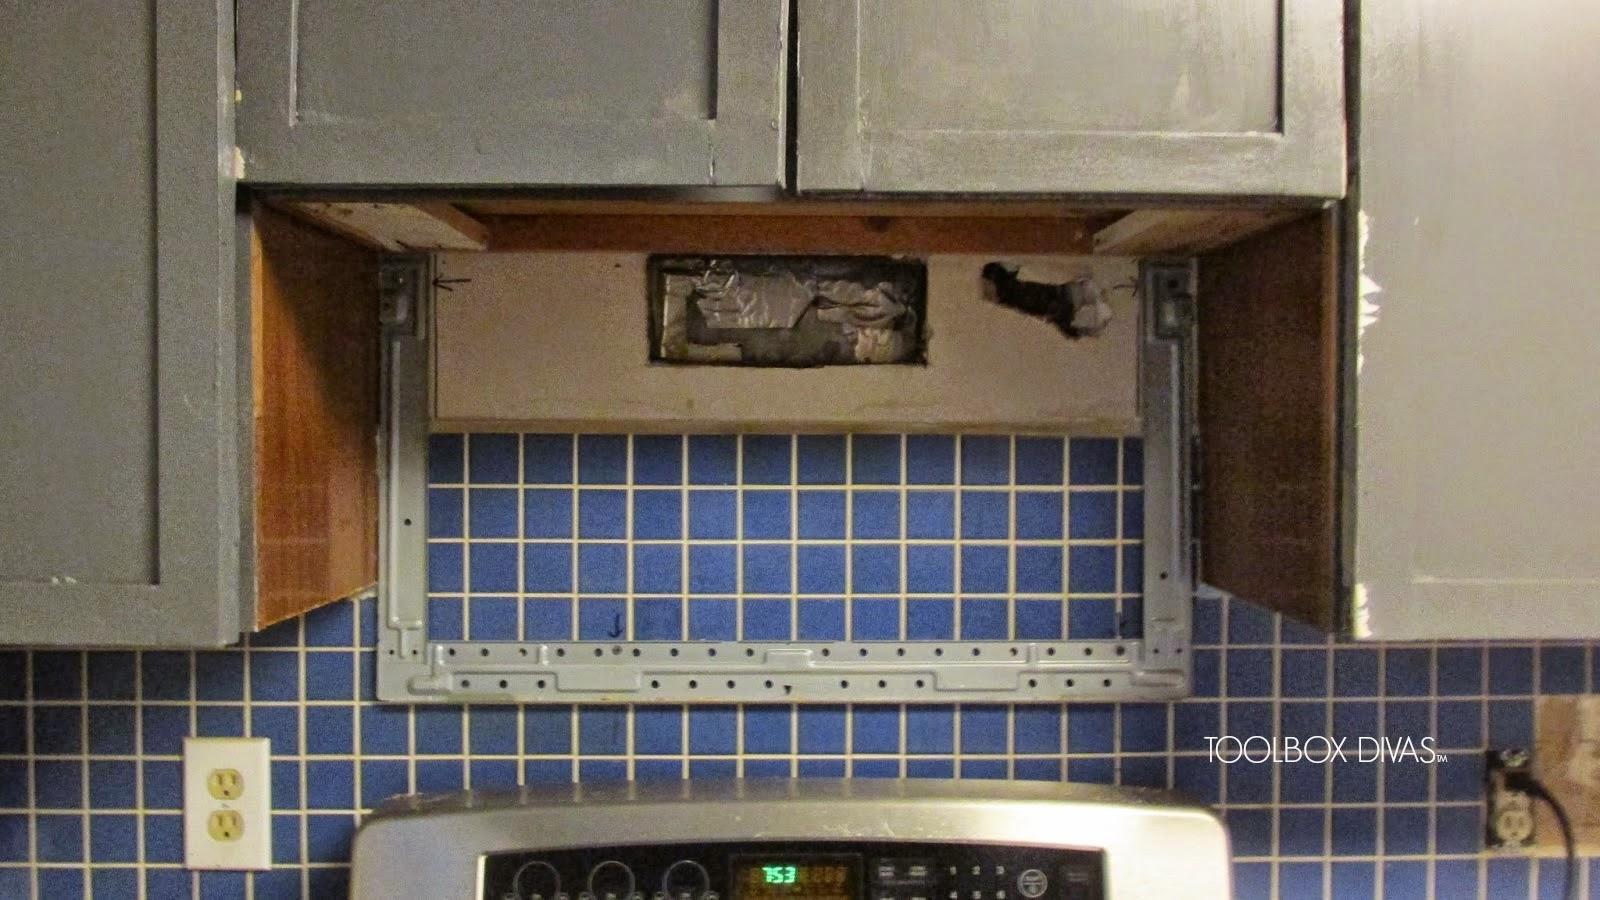 Tile Removal 101 Remove The Tile Backsplash Without